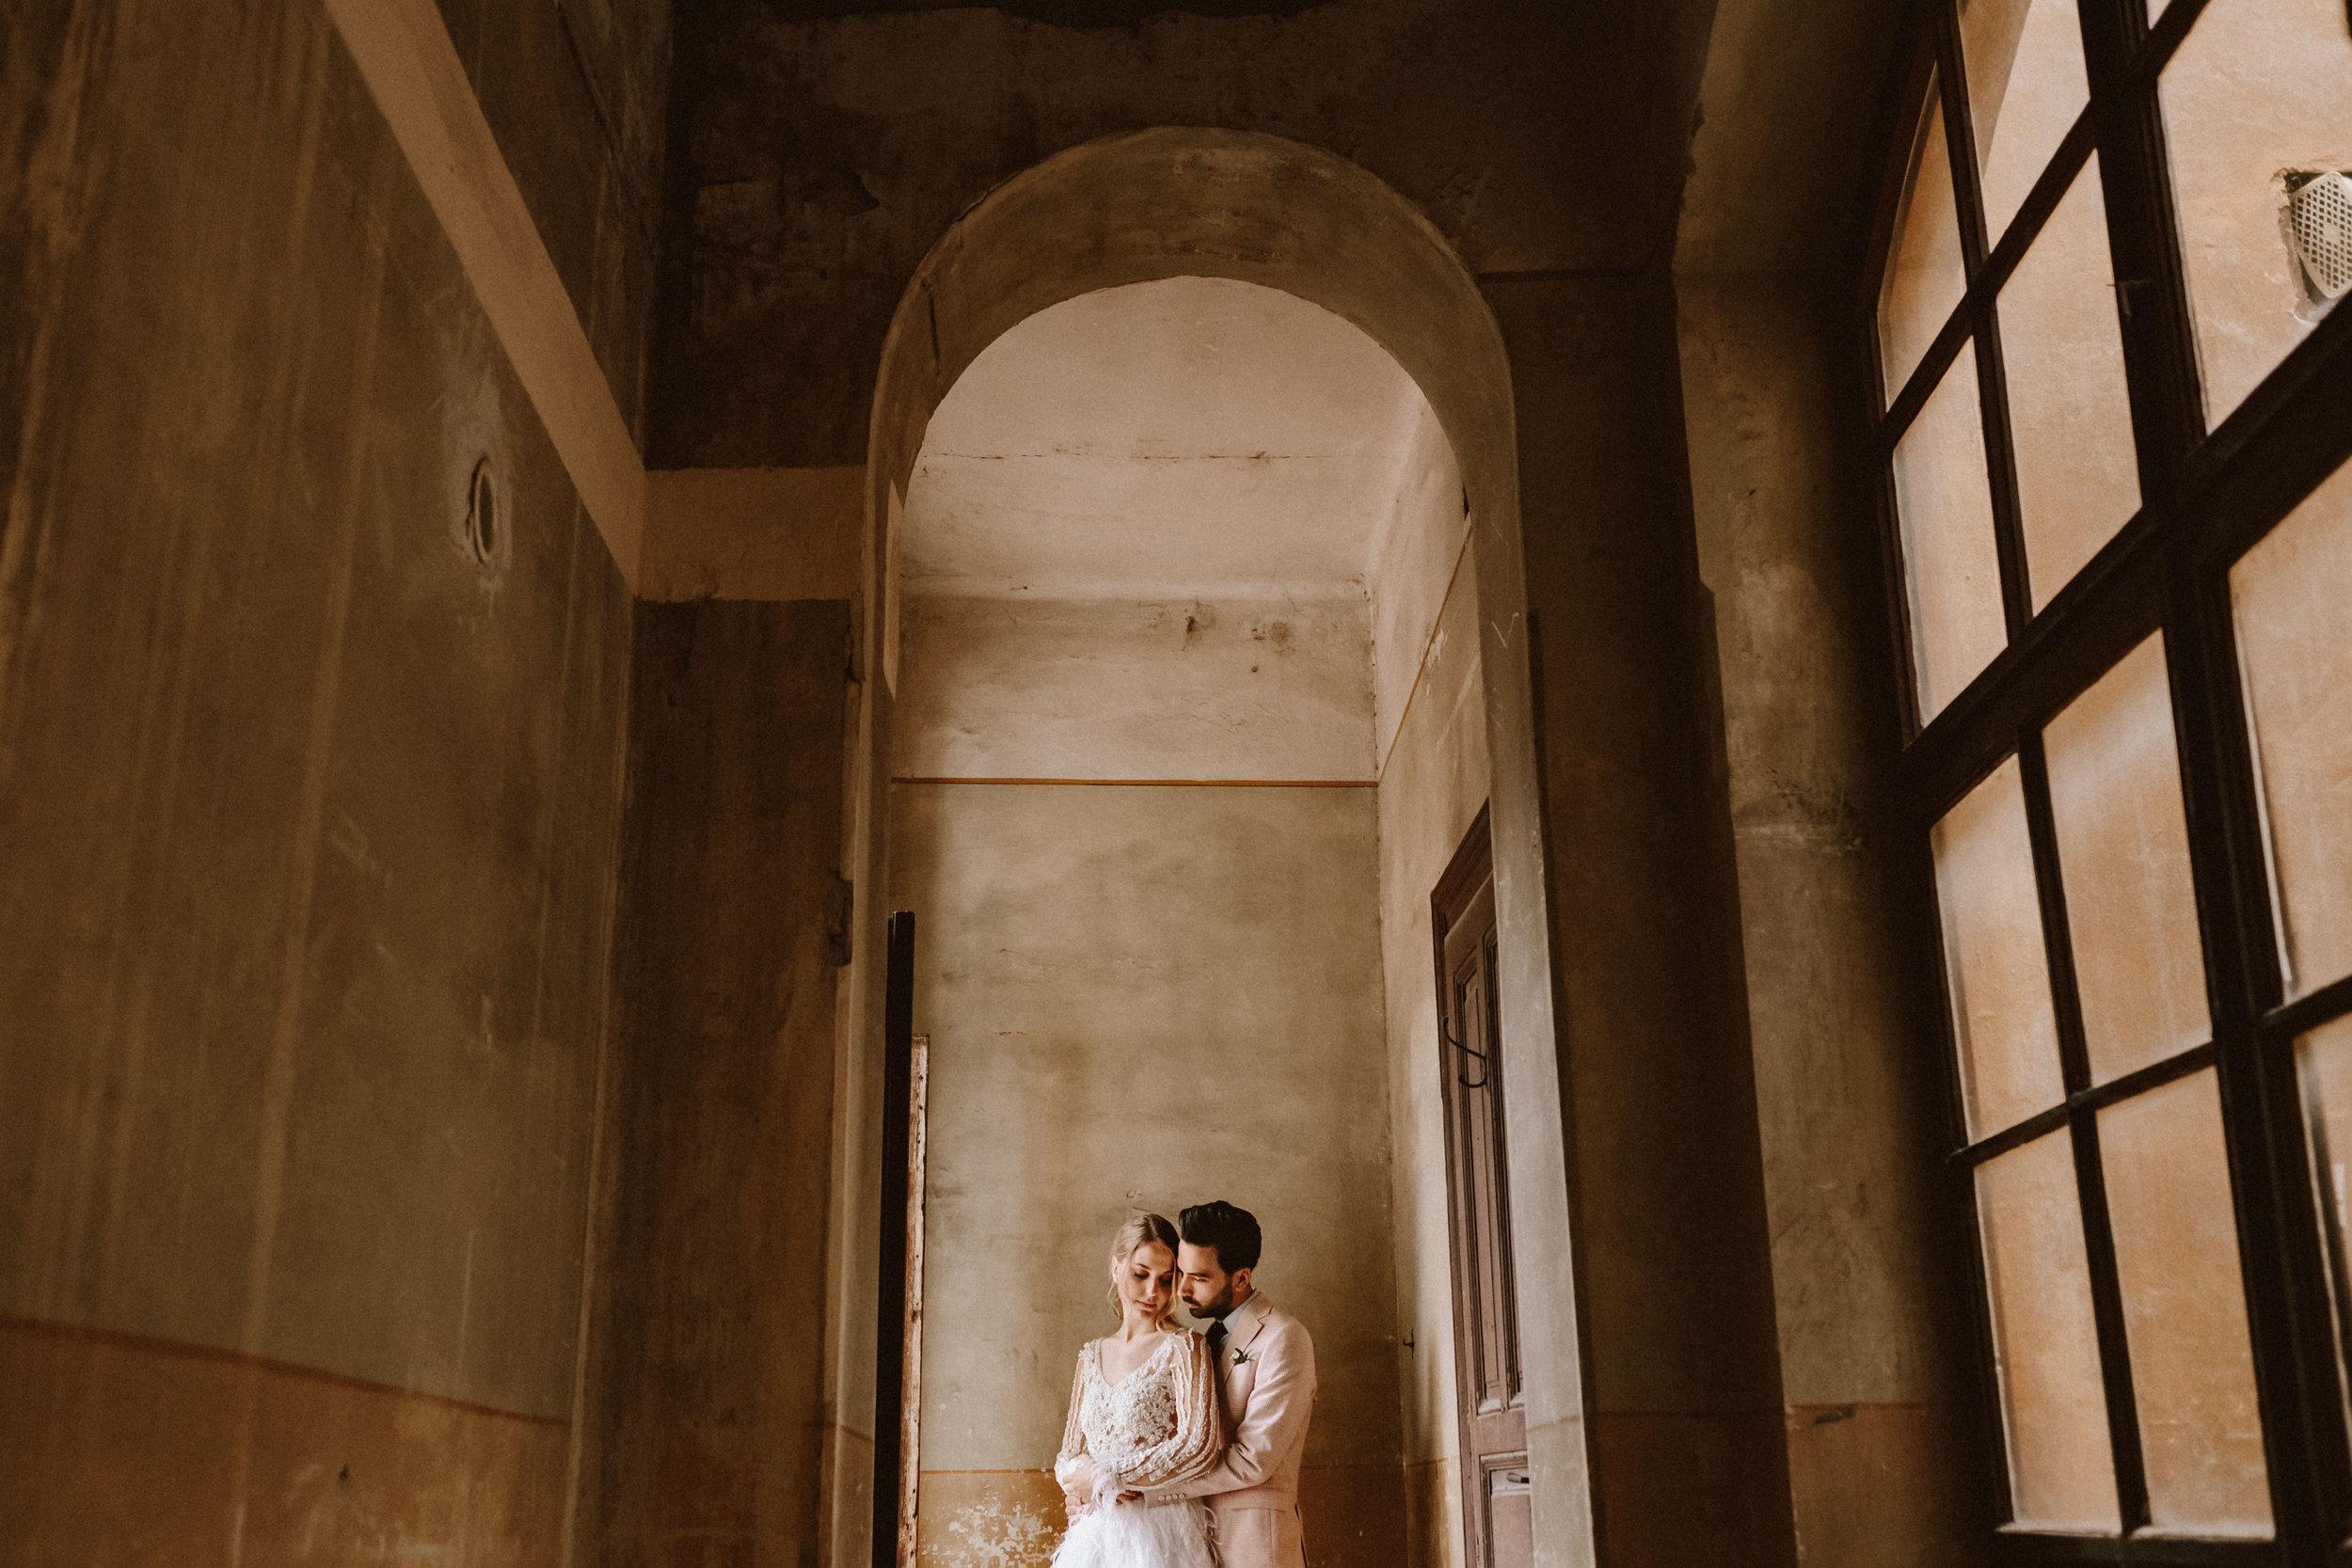 1819-Evelin+Peti-wedding-176-w.jpg